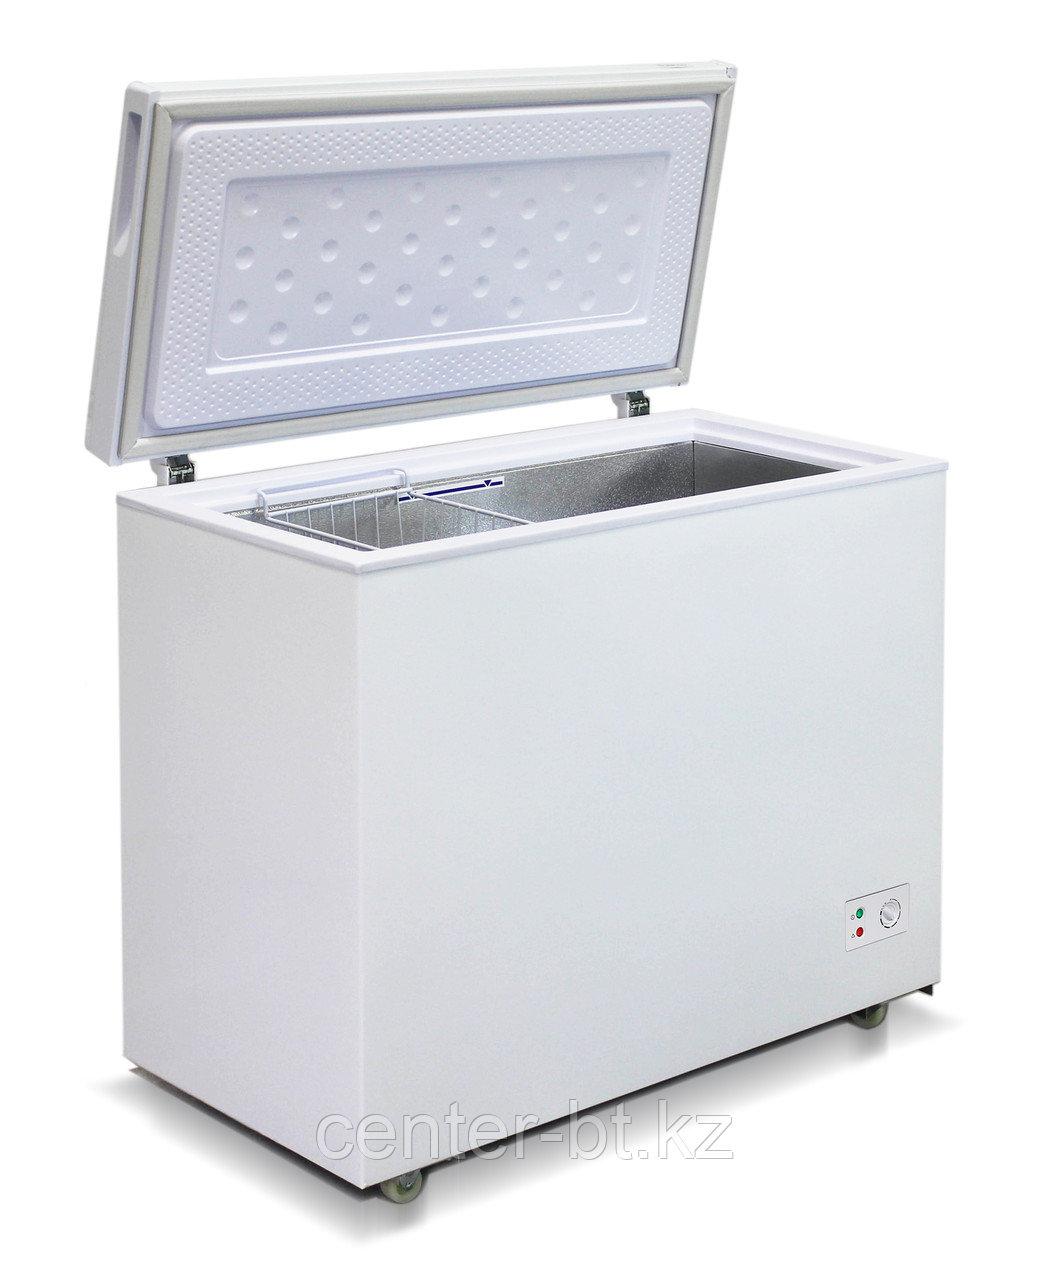 Морозильная камера ларь Бирюса-240KX